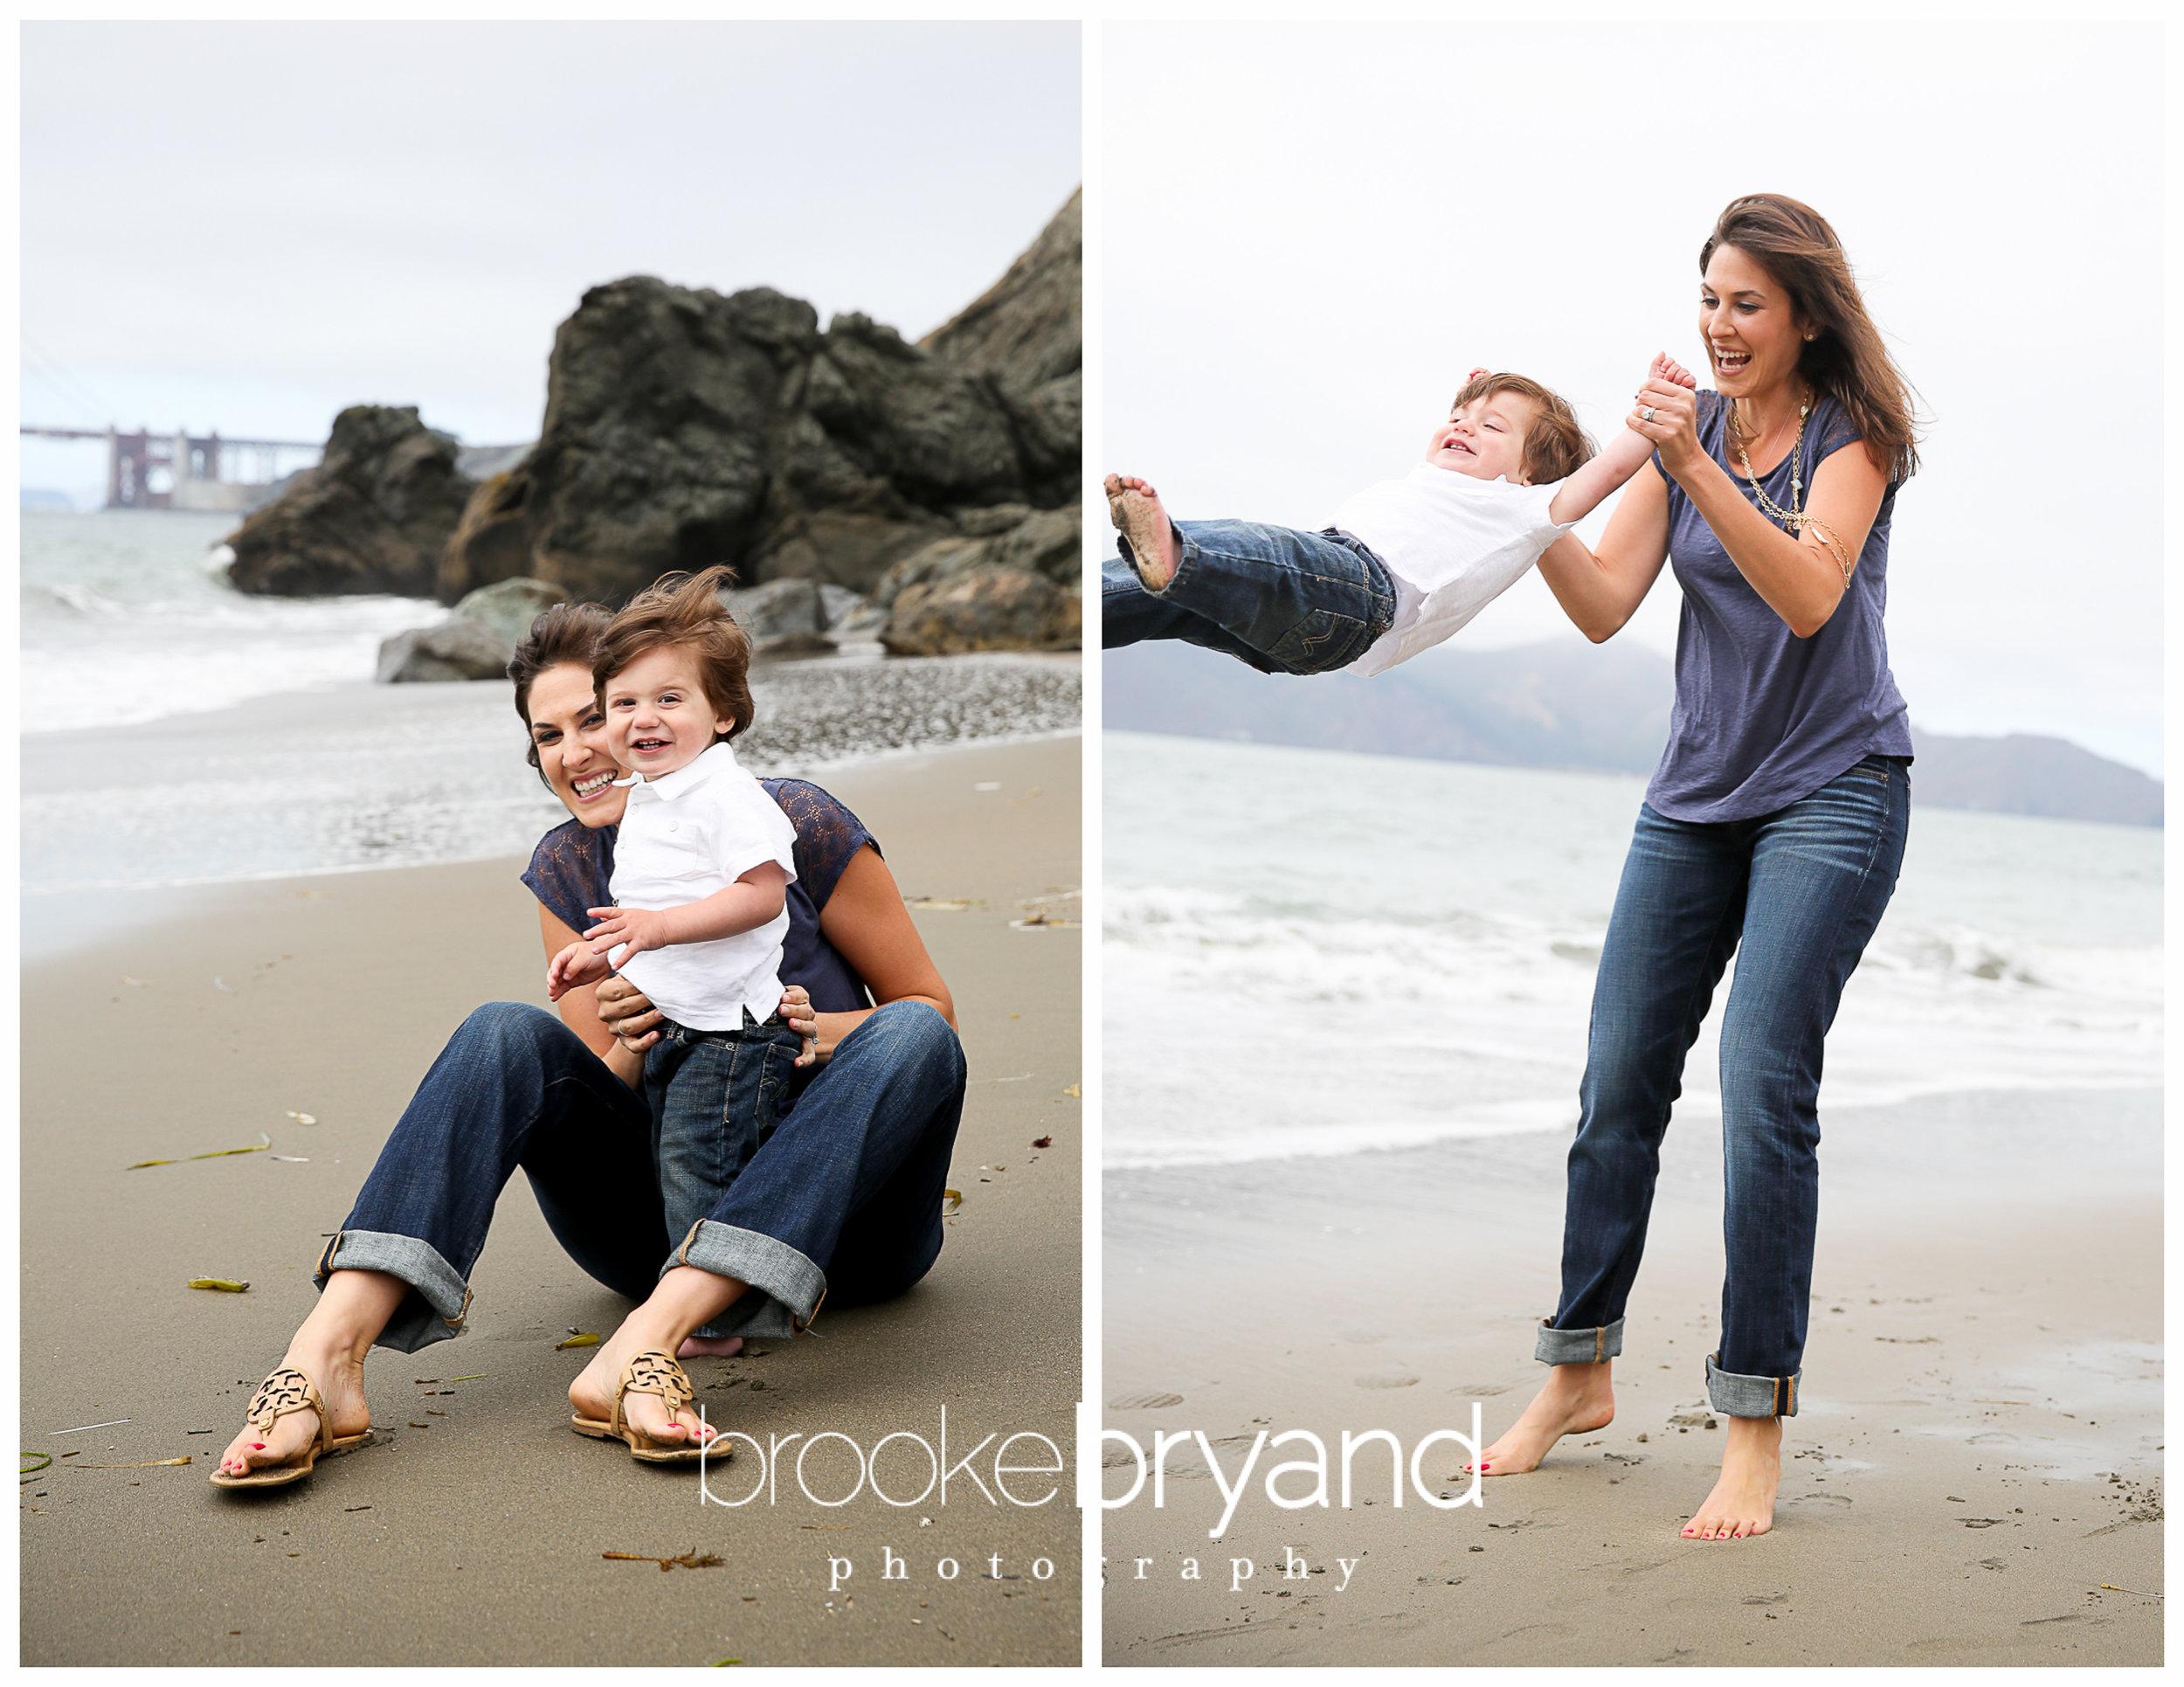 Brooke-Bryand-Photography-San-Francisco-Family-Photographer-First-Year-Photos-San-Francisco-Beach-Family-Photos-2-up-jackson-3.jpg